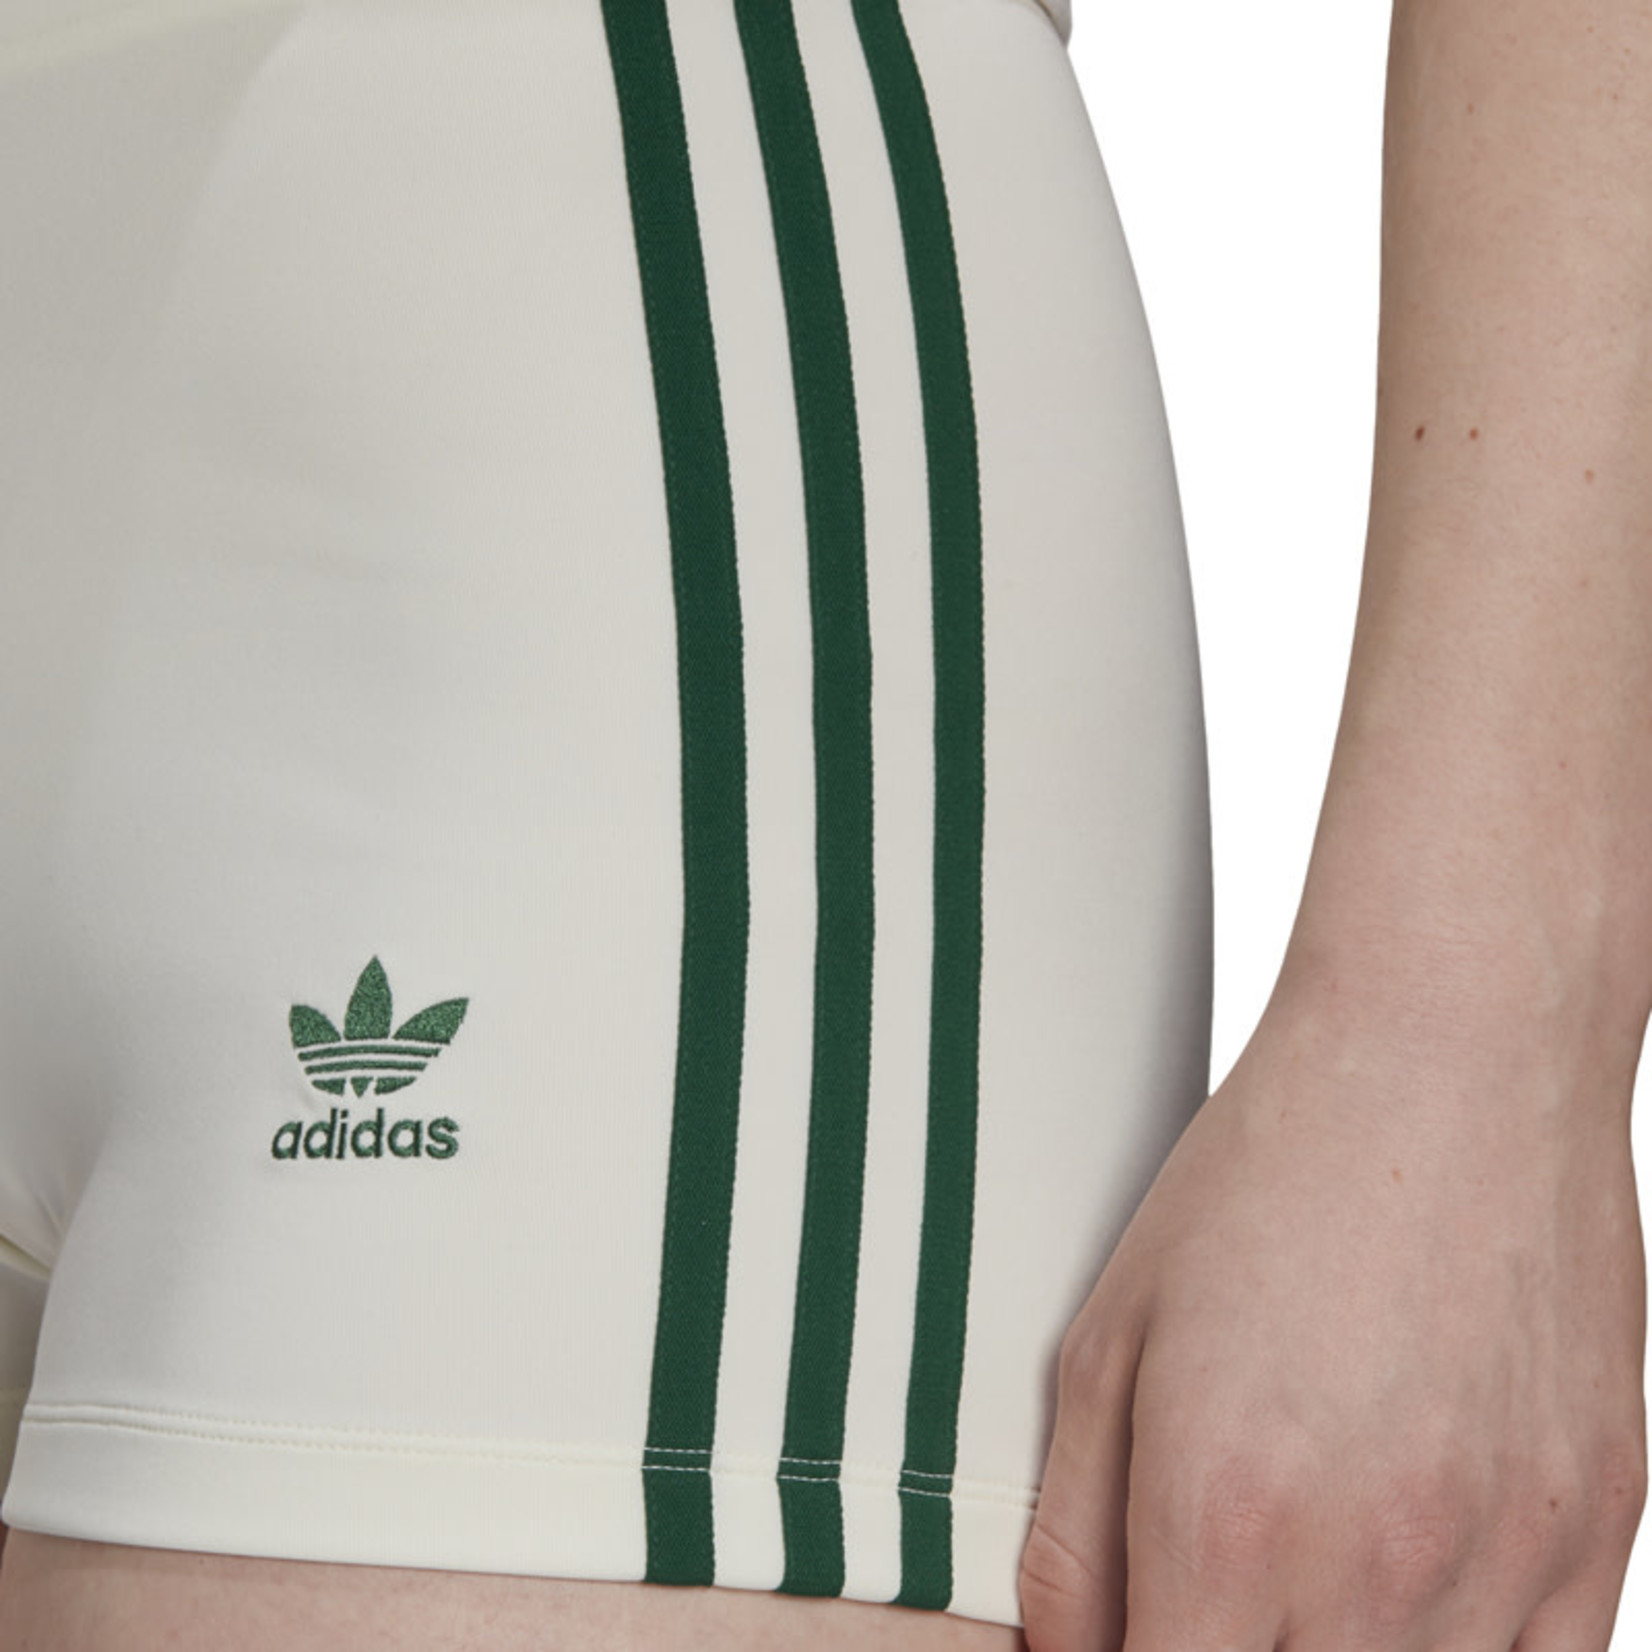 Adidas Adidas : Booty Tight Short